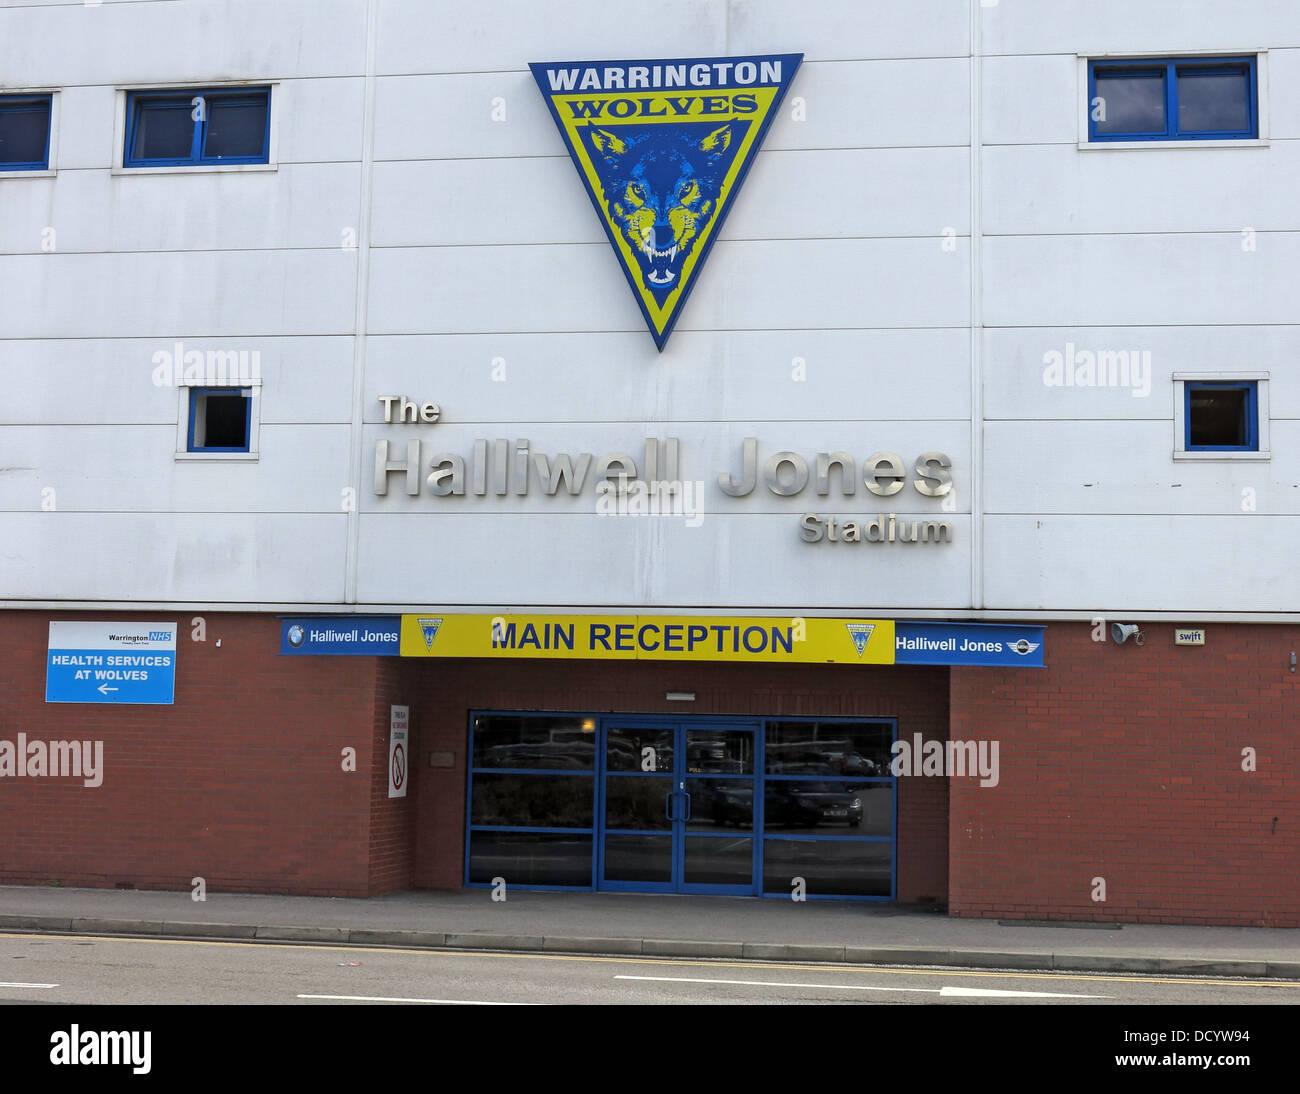 Warrington,Rugby,League,Wolve,Wolfs,history,sporting,heritage,historic,world,cup,2013,Samoa,New,Zealand,match,game,venue,for,BMW,dealer,stadia,UK,English,england,Wilderspool,Tetley,Walker,brewery,site,gotonysmith,Jones,Halliwell,Rugby,stadium,Winwick,Road,Warrington,WA2,7NE,United,Kingdom,WA27NE,Buy Pictures of,Buy Images Of